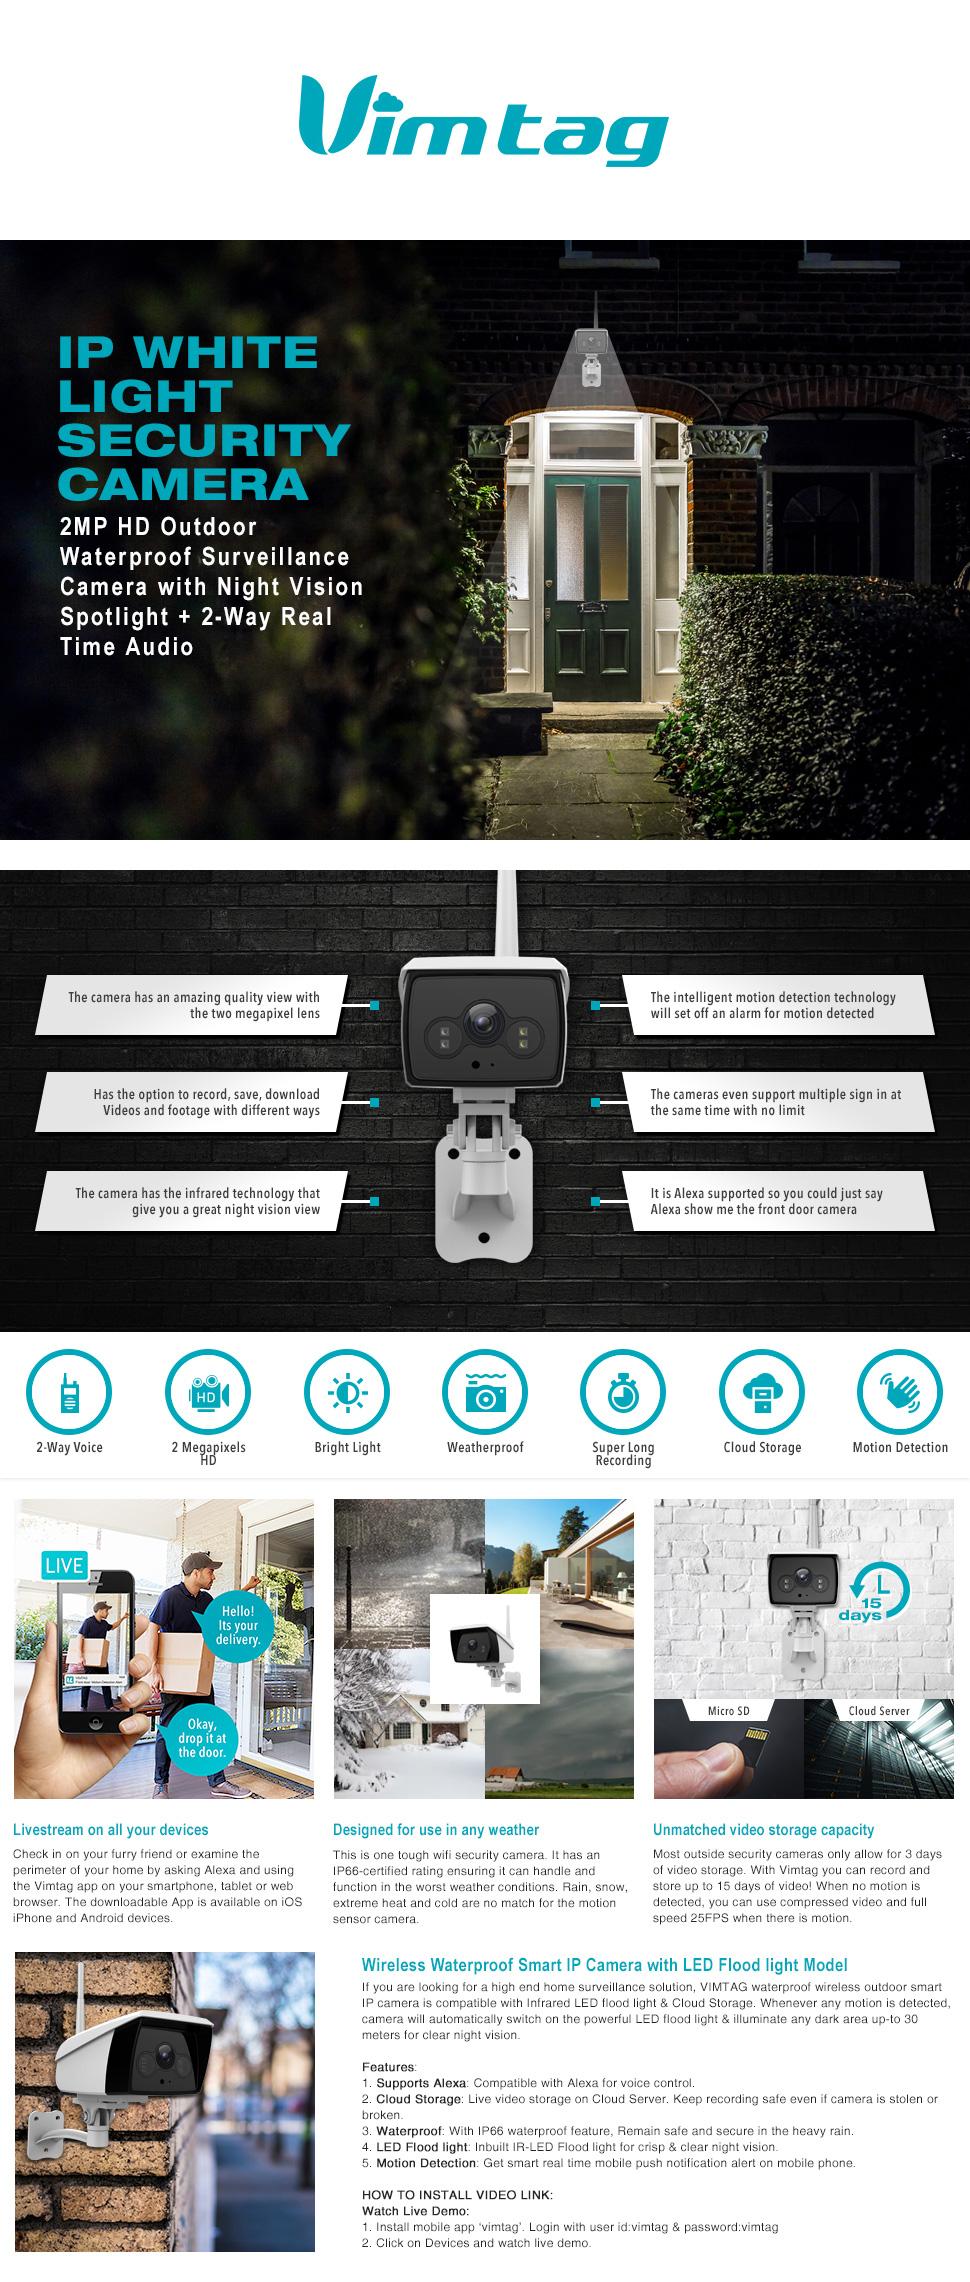 SpotlightCamera-EBC_rev2 (1) (1)